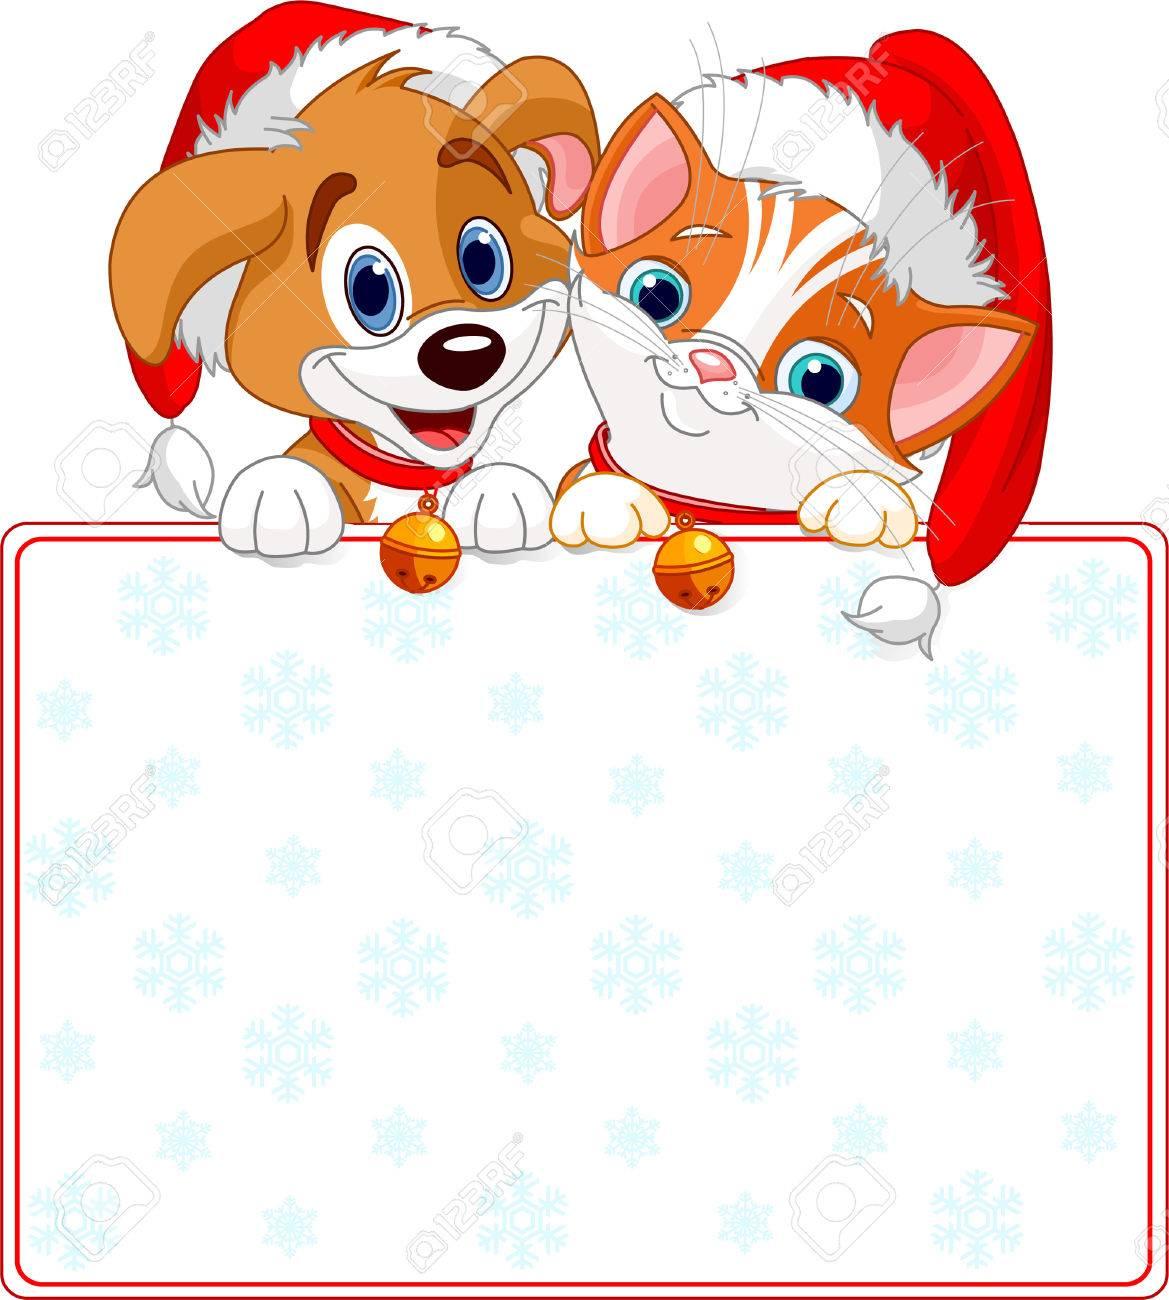 1169x1300 28,818 Dog Cat Cliparts, Stock Vector Royalty Free Dog